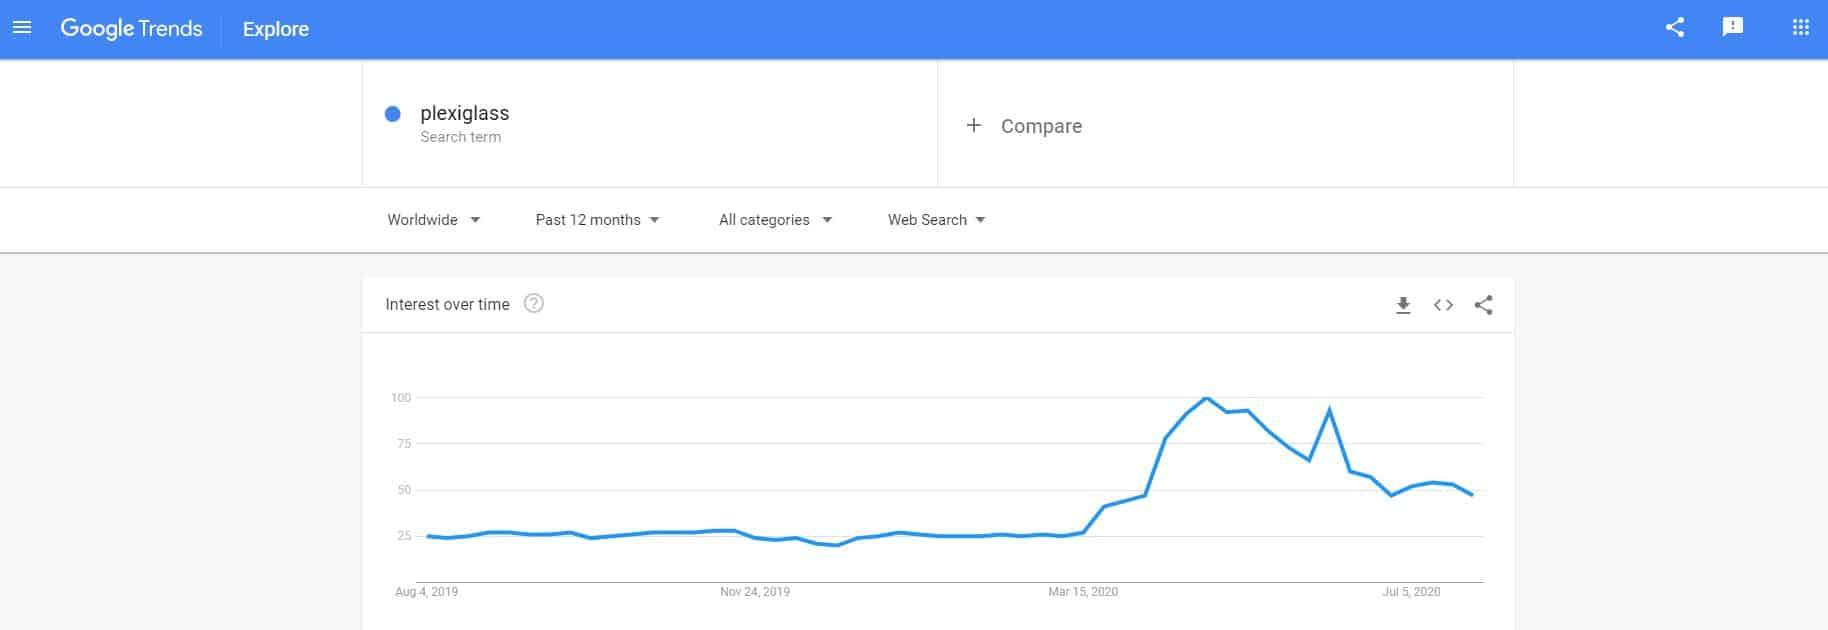 Google Trends - plexiglass